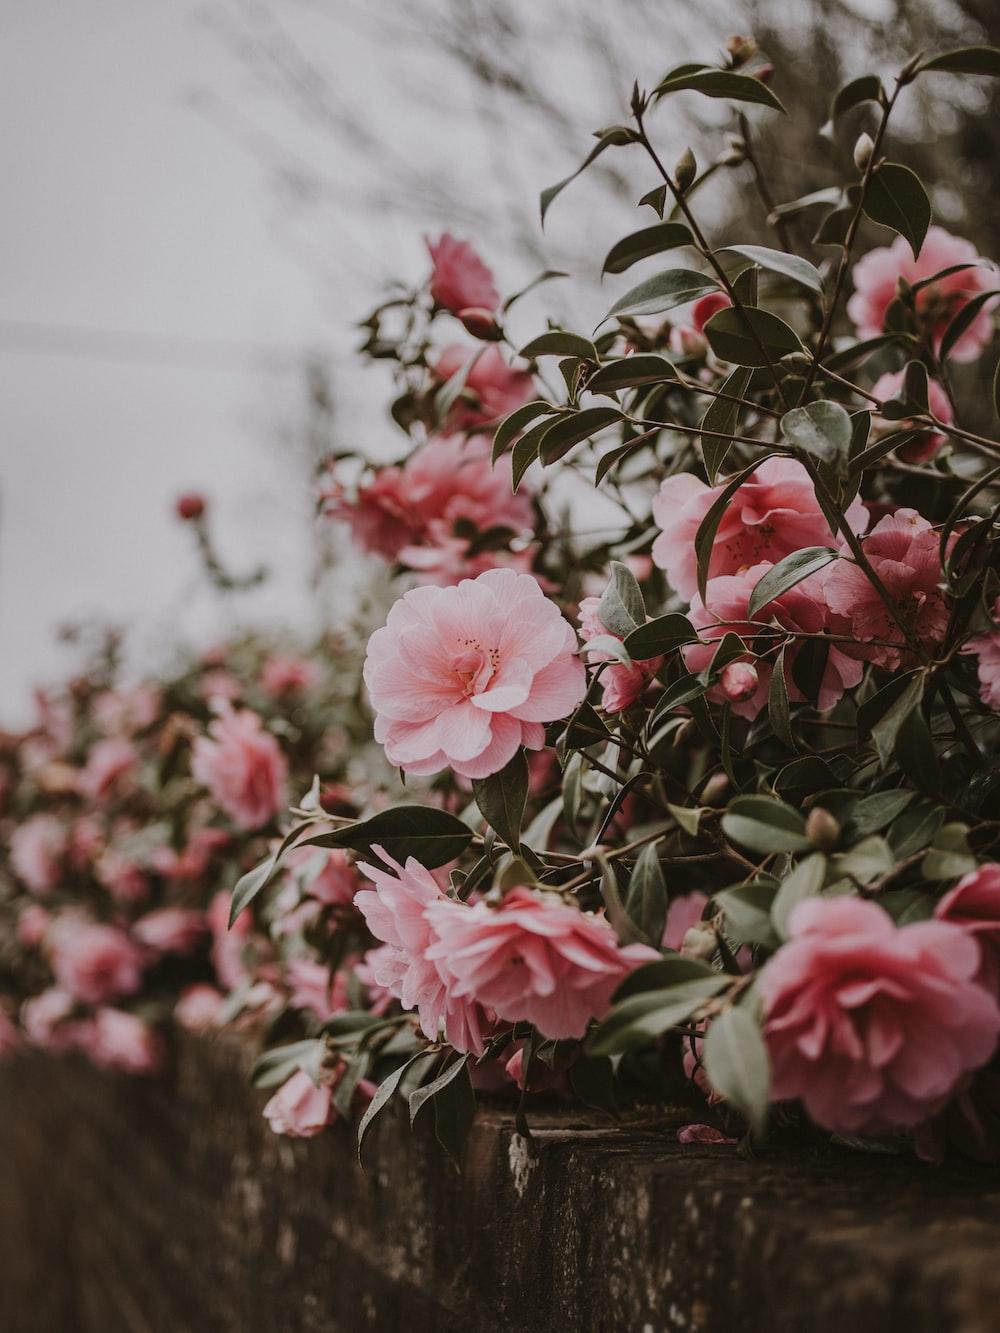 selective focus photo of peony flower